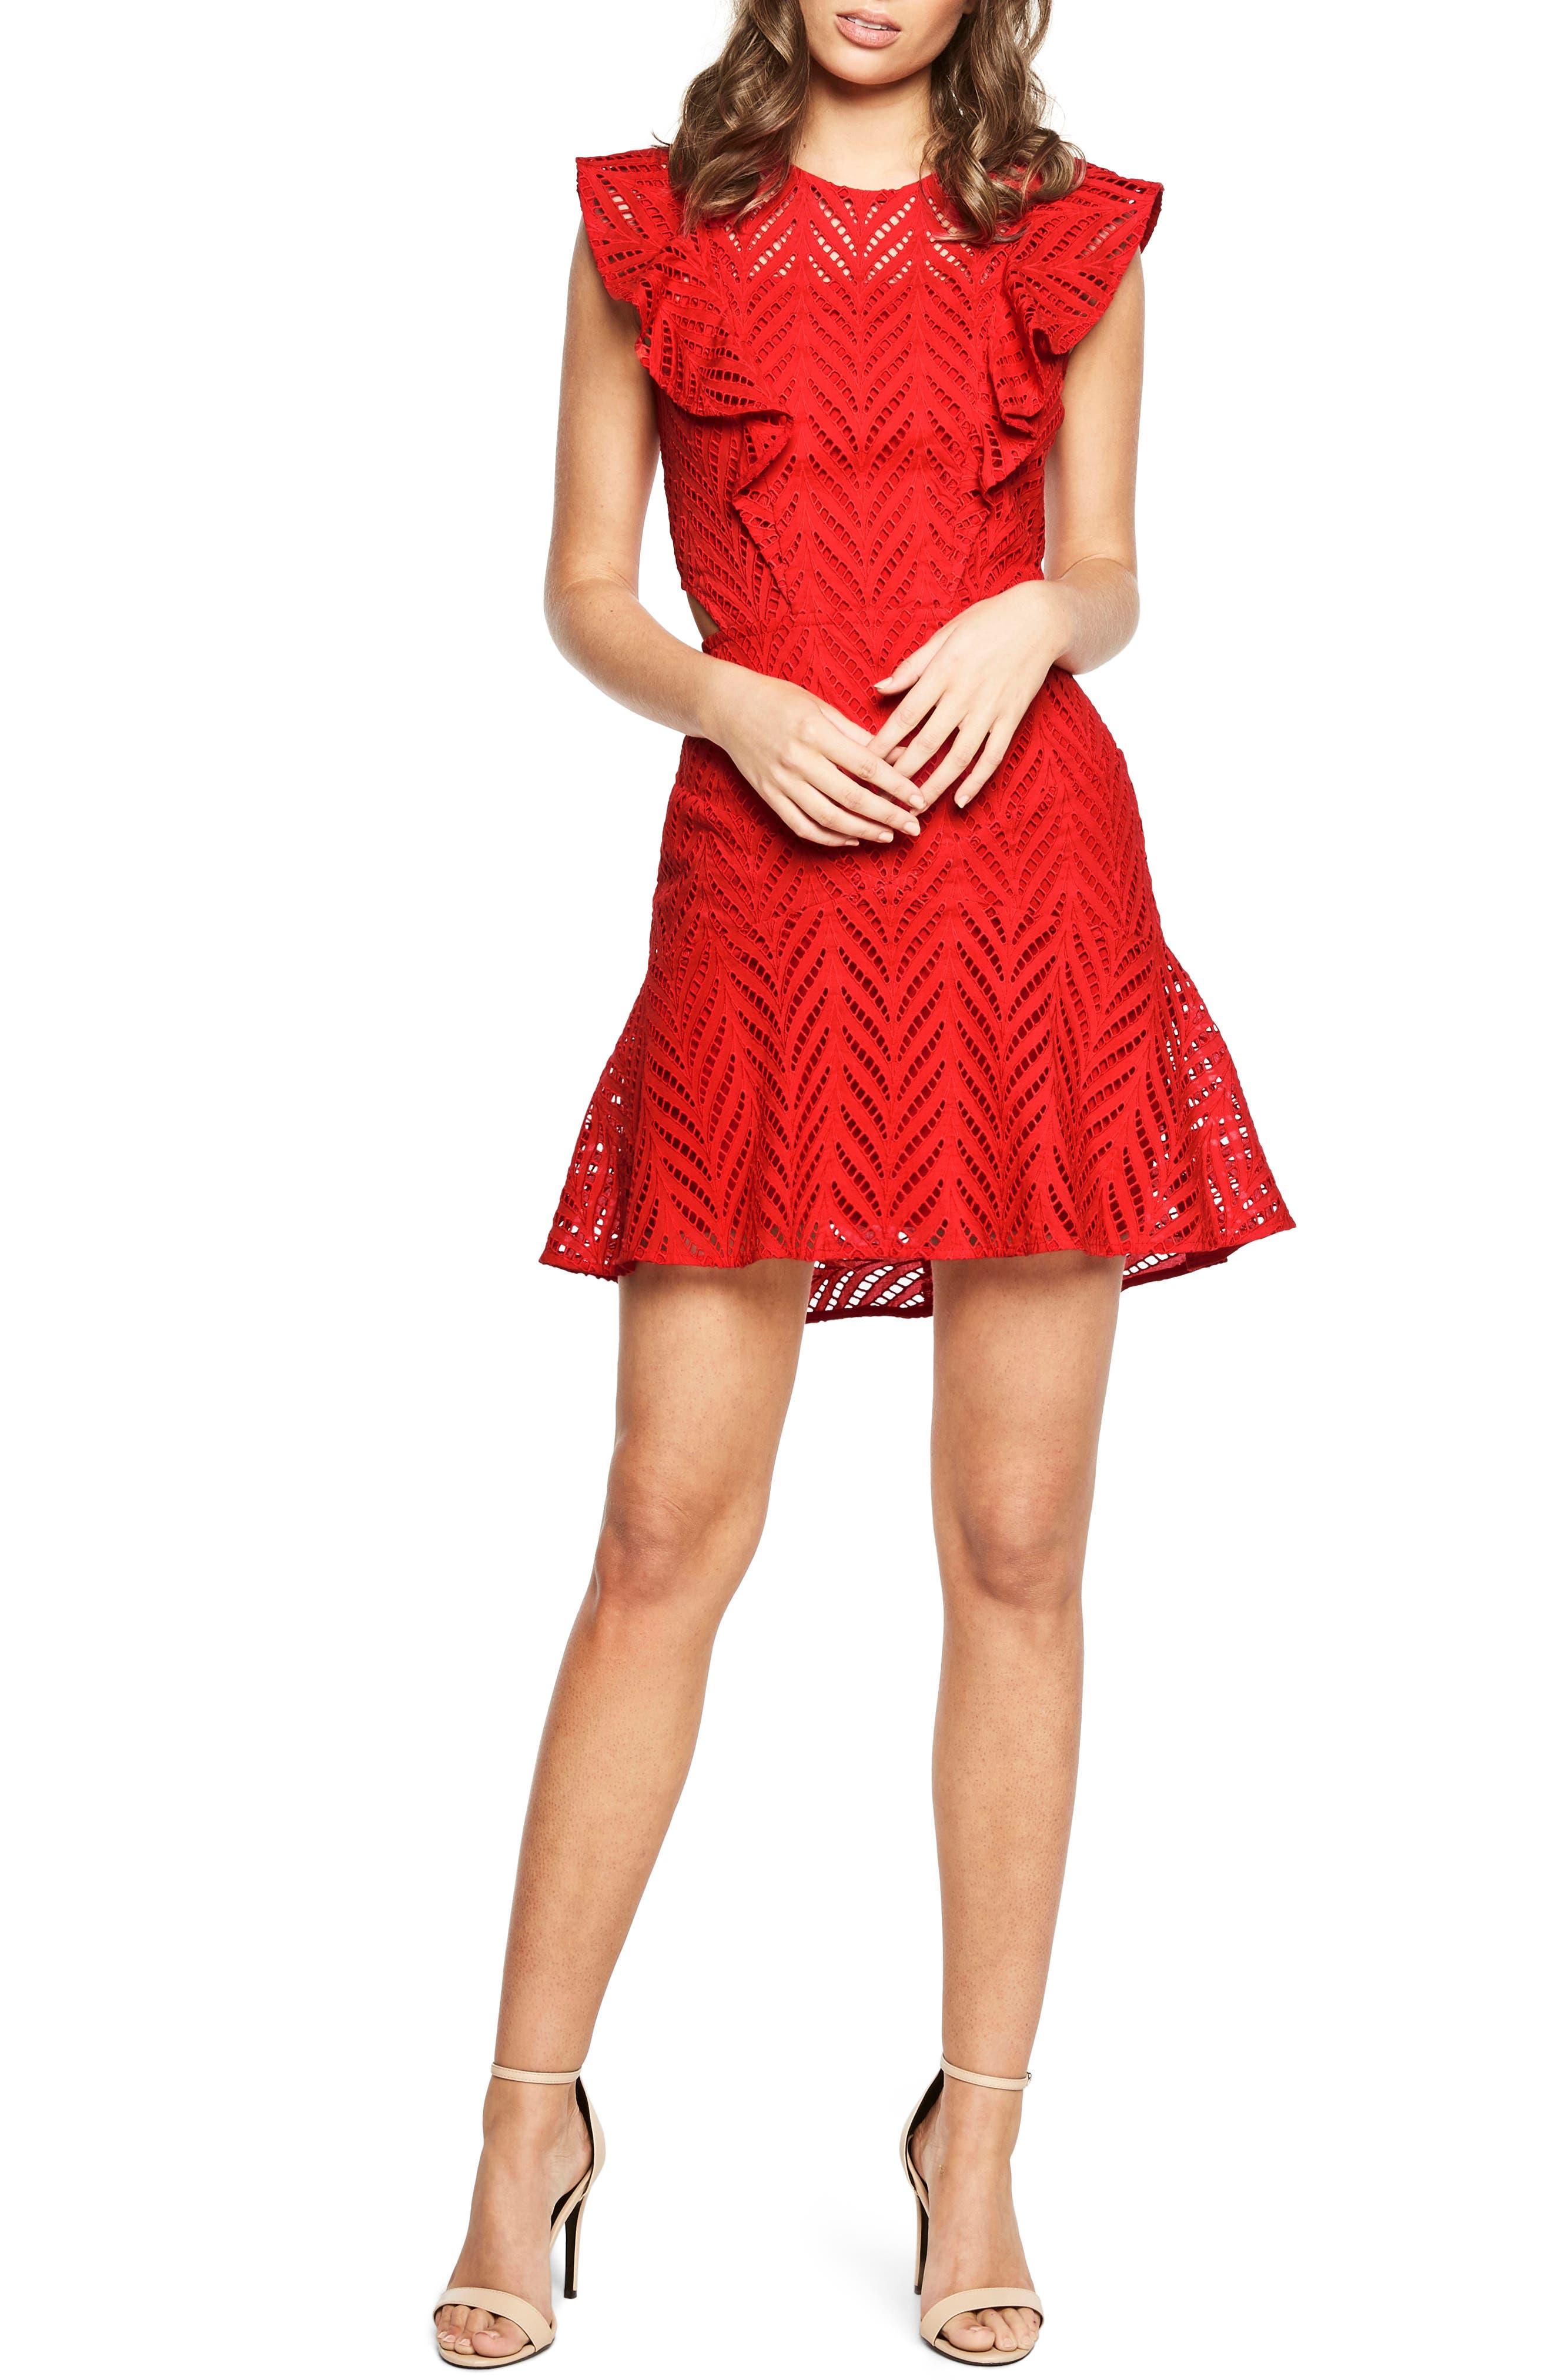 Kira Crochet Ruffle Dress,                         Main,                         color, Lipstick Red